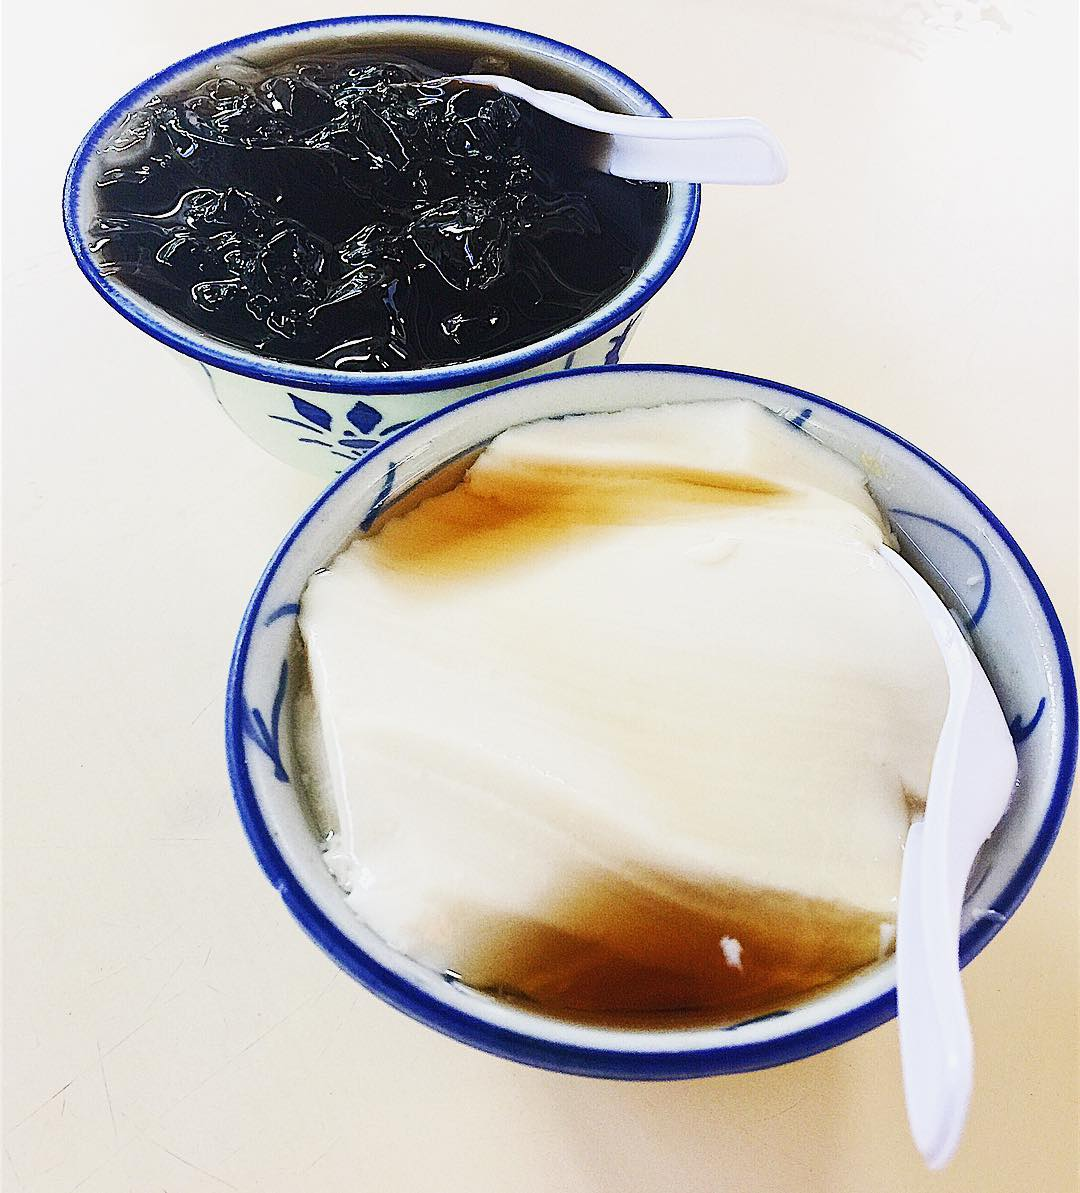 traditional Chinese dessert - tan soon mui-min